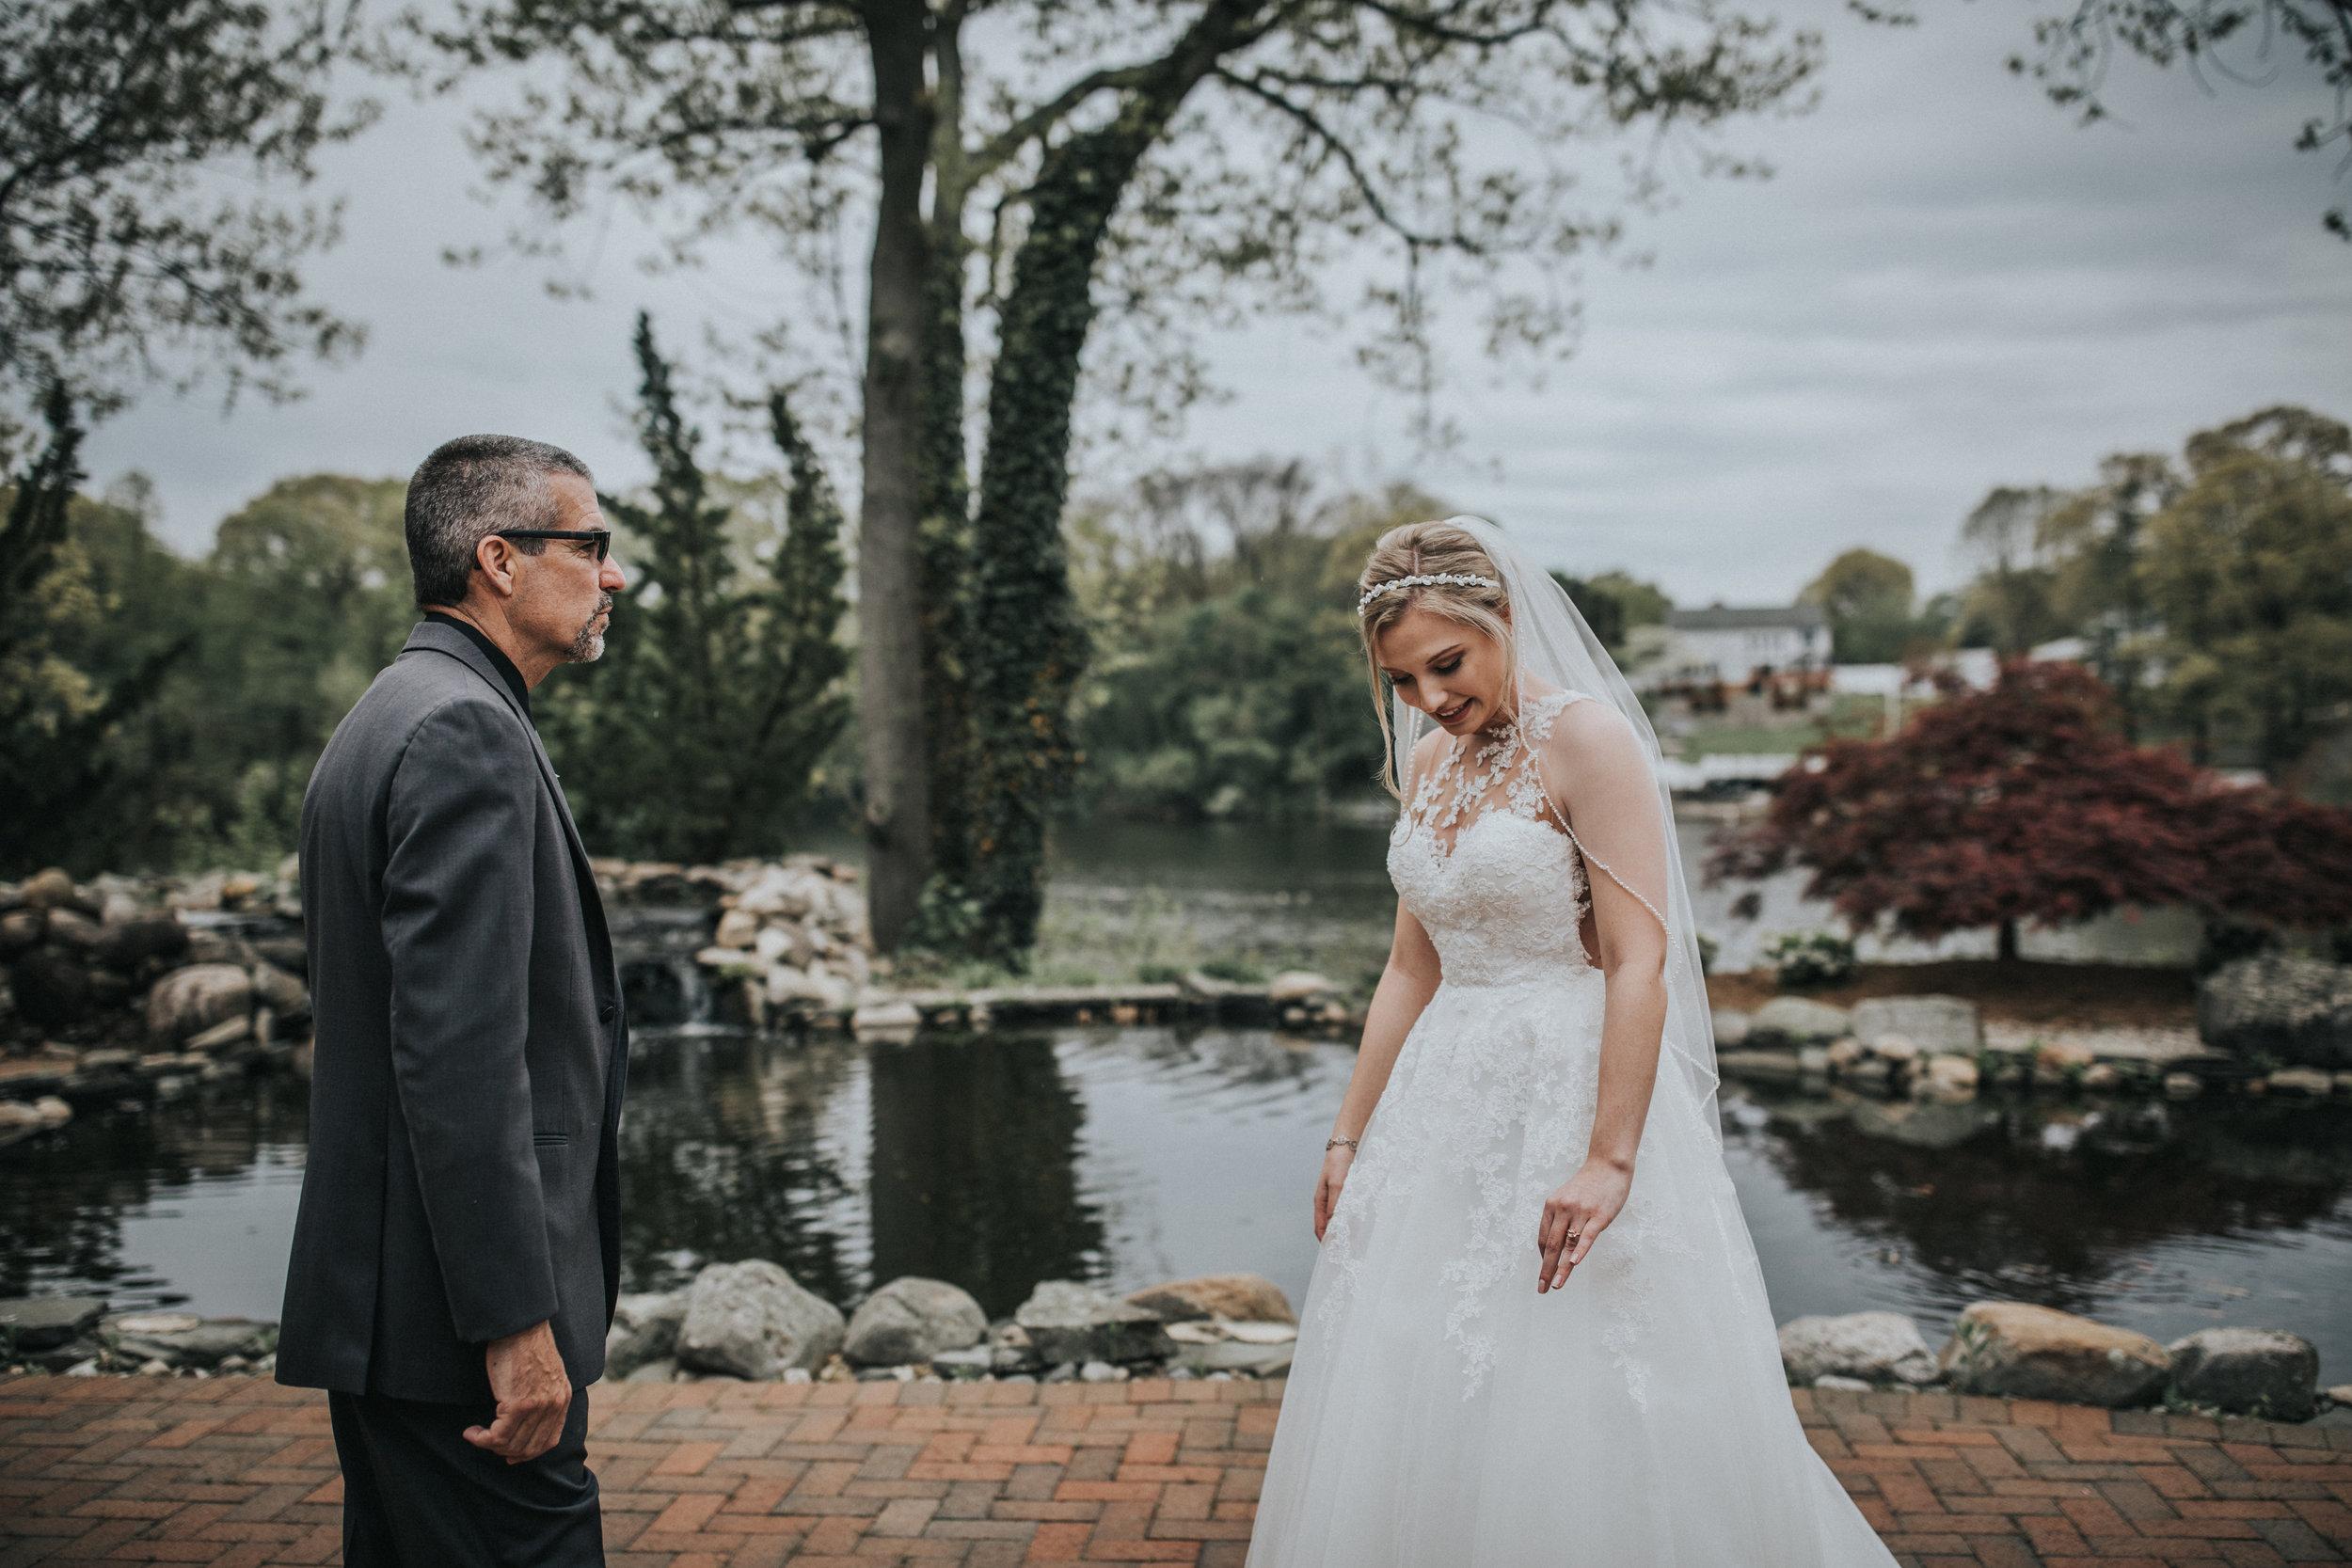 New-Jersey-Wedding-Photographer-Megan&Nick-FirstLooks-31.jpg